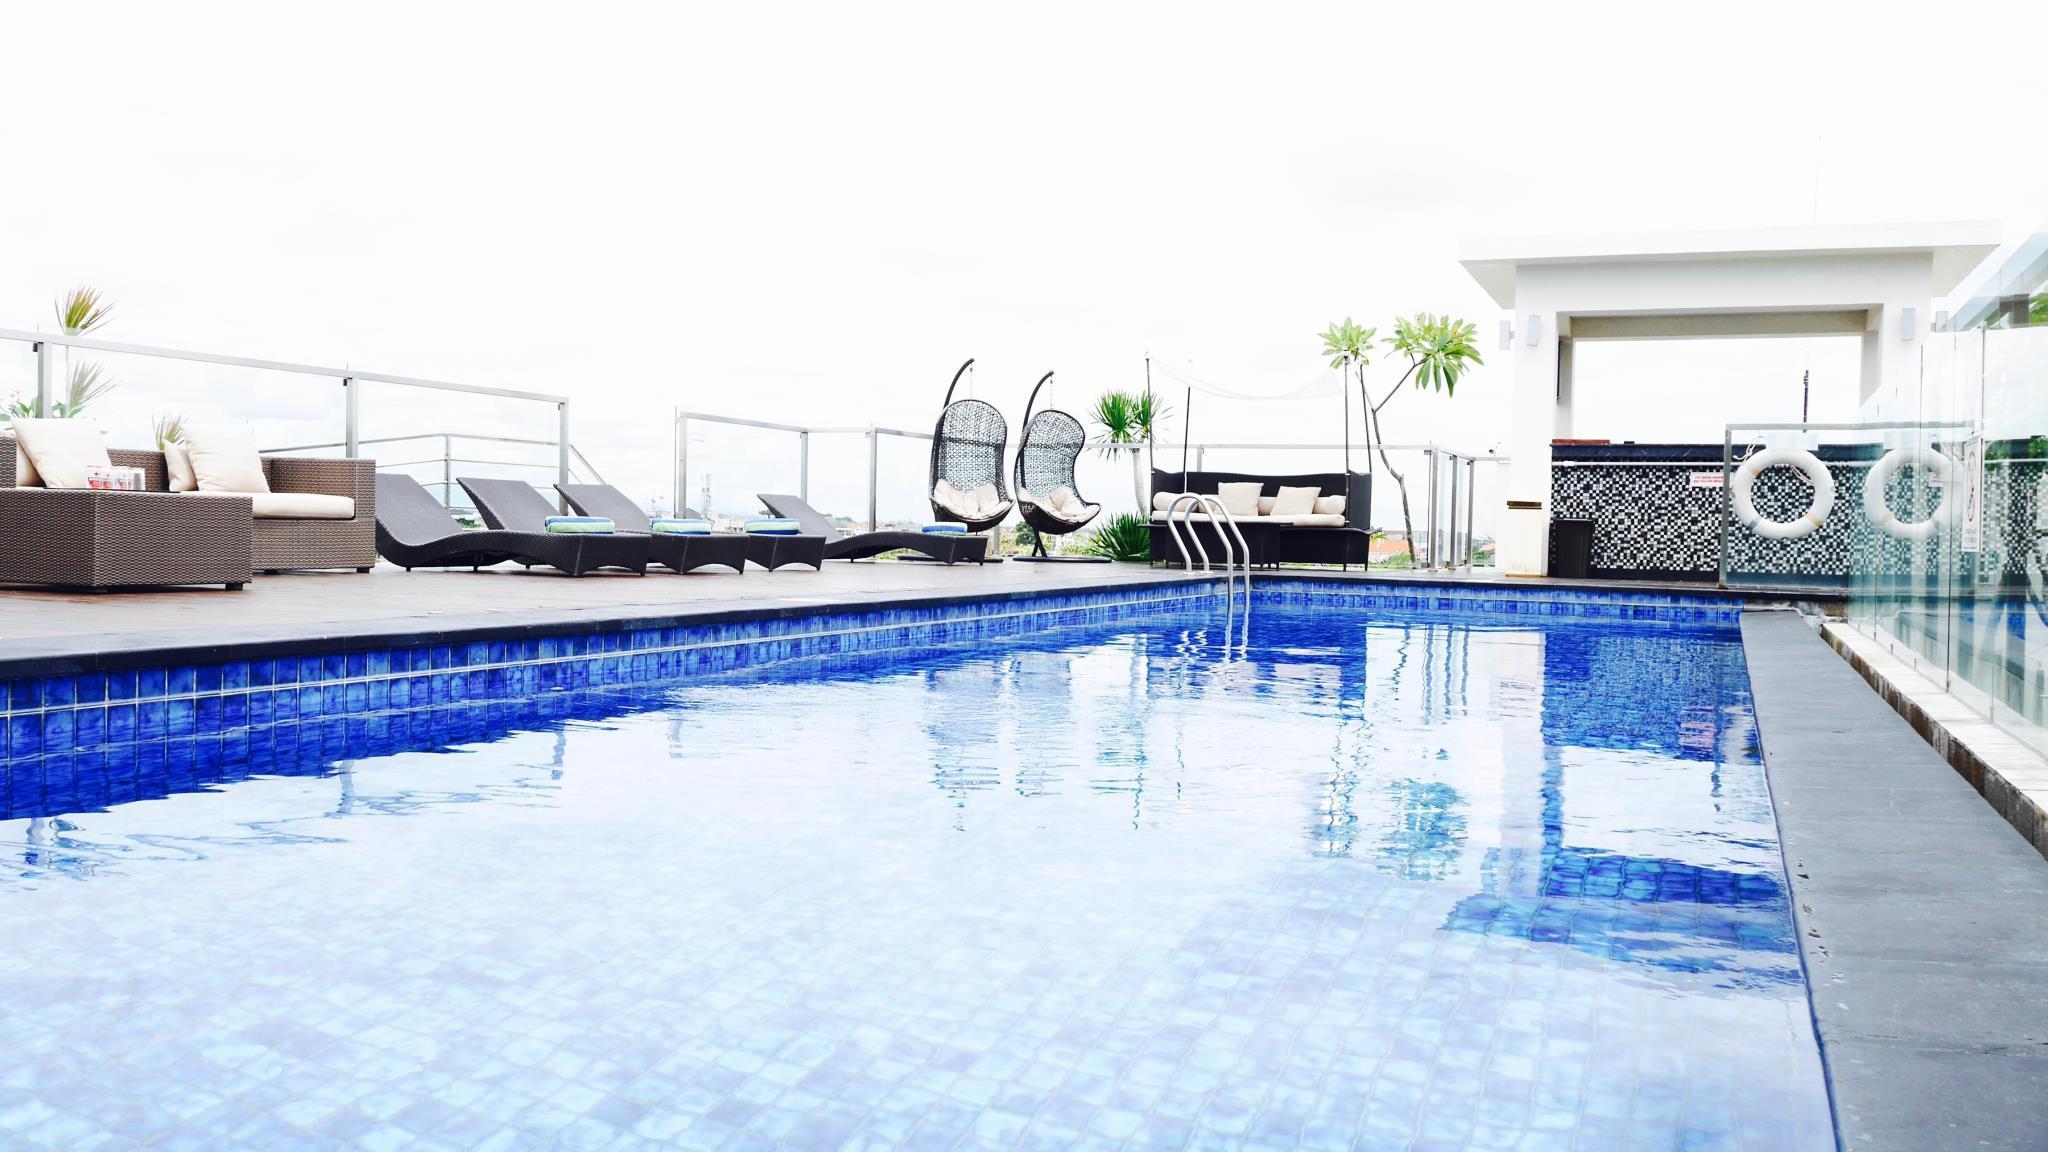 Hotel Zia Bali Kuta - Jalan Ciung Wanara No.17, Banjar Teegal, Kuta, Kabupaten Badung ,Bali - Bali